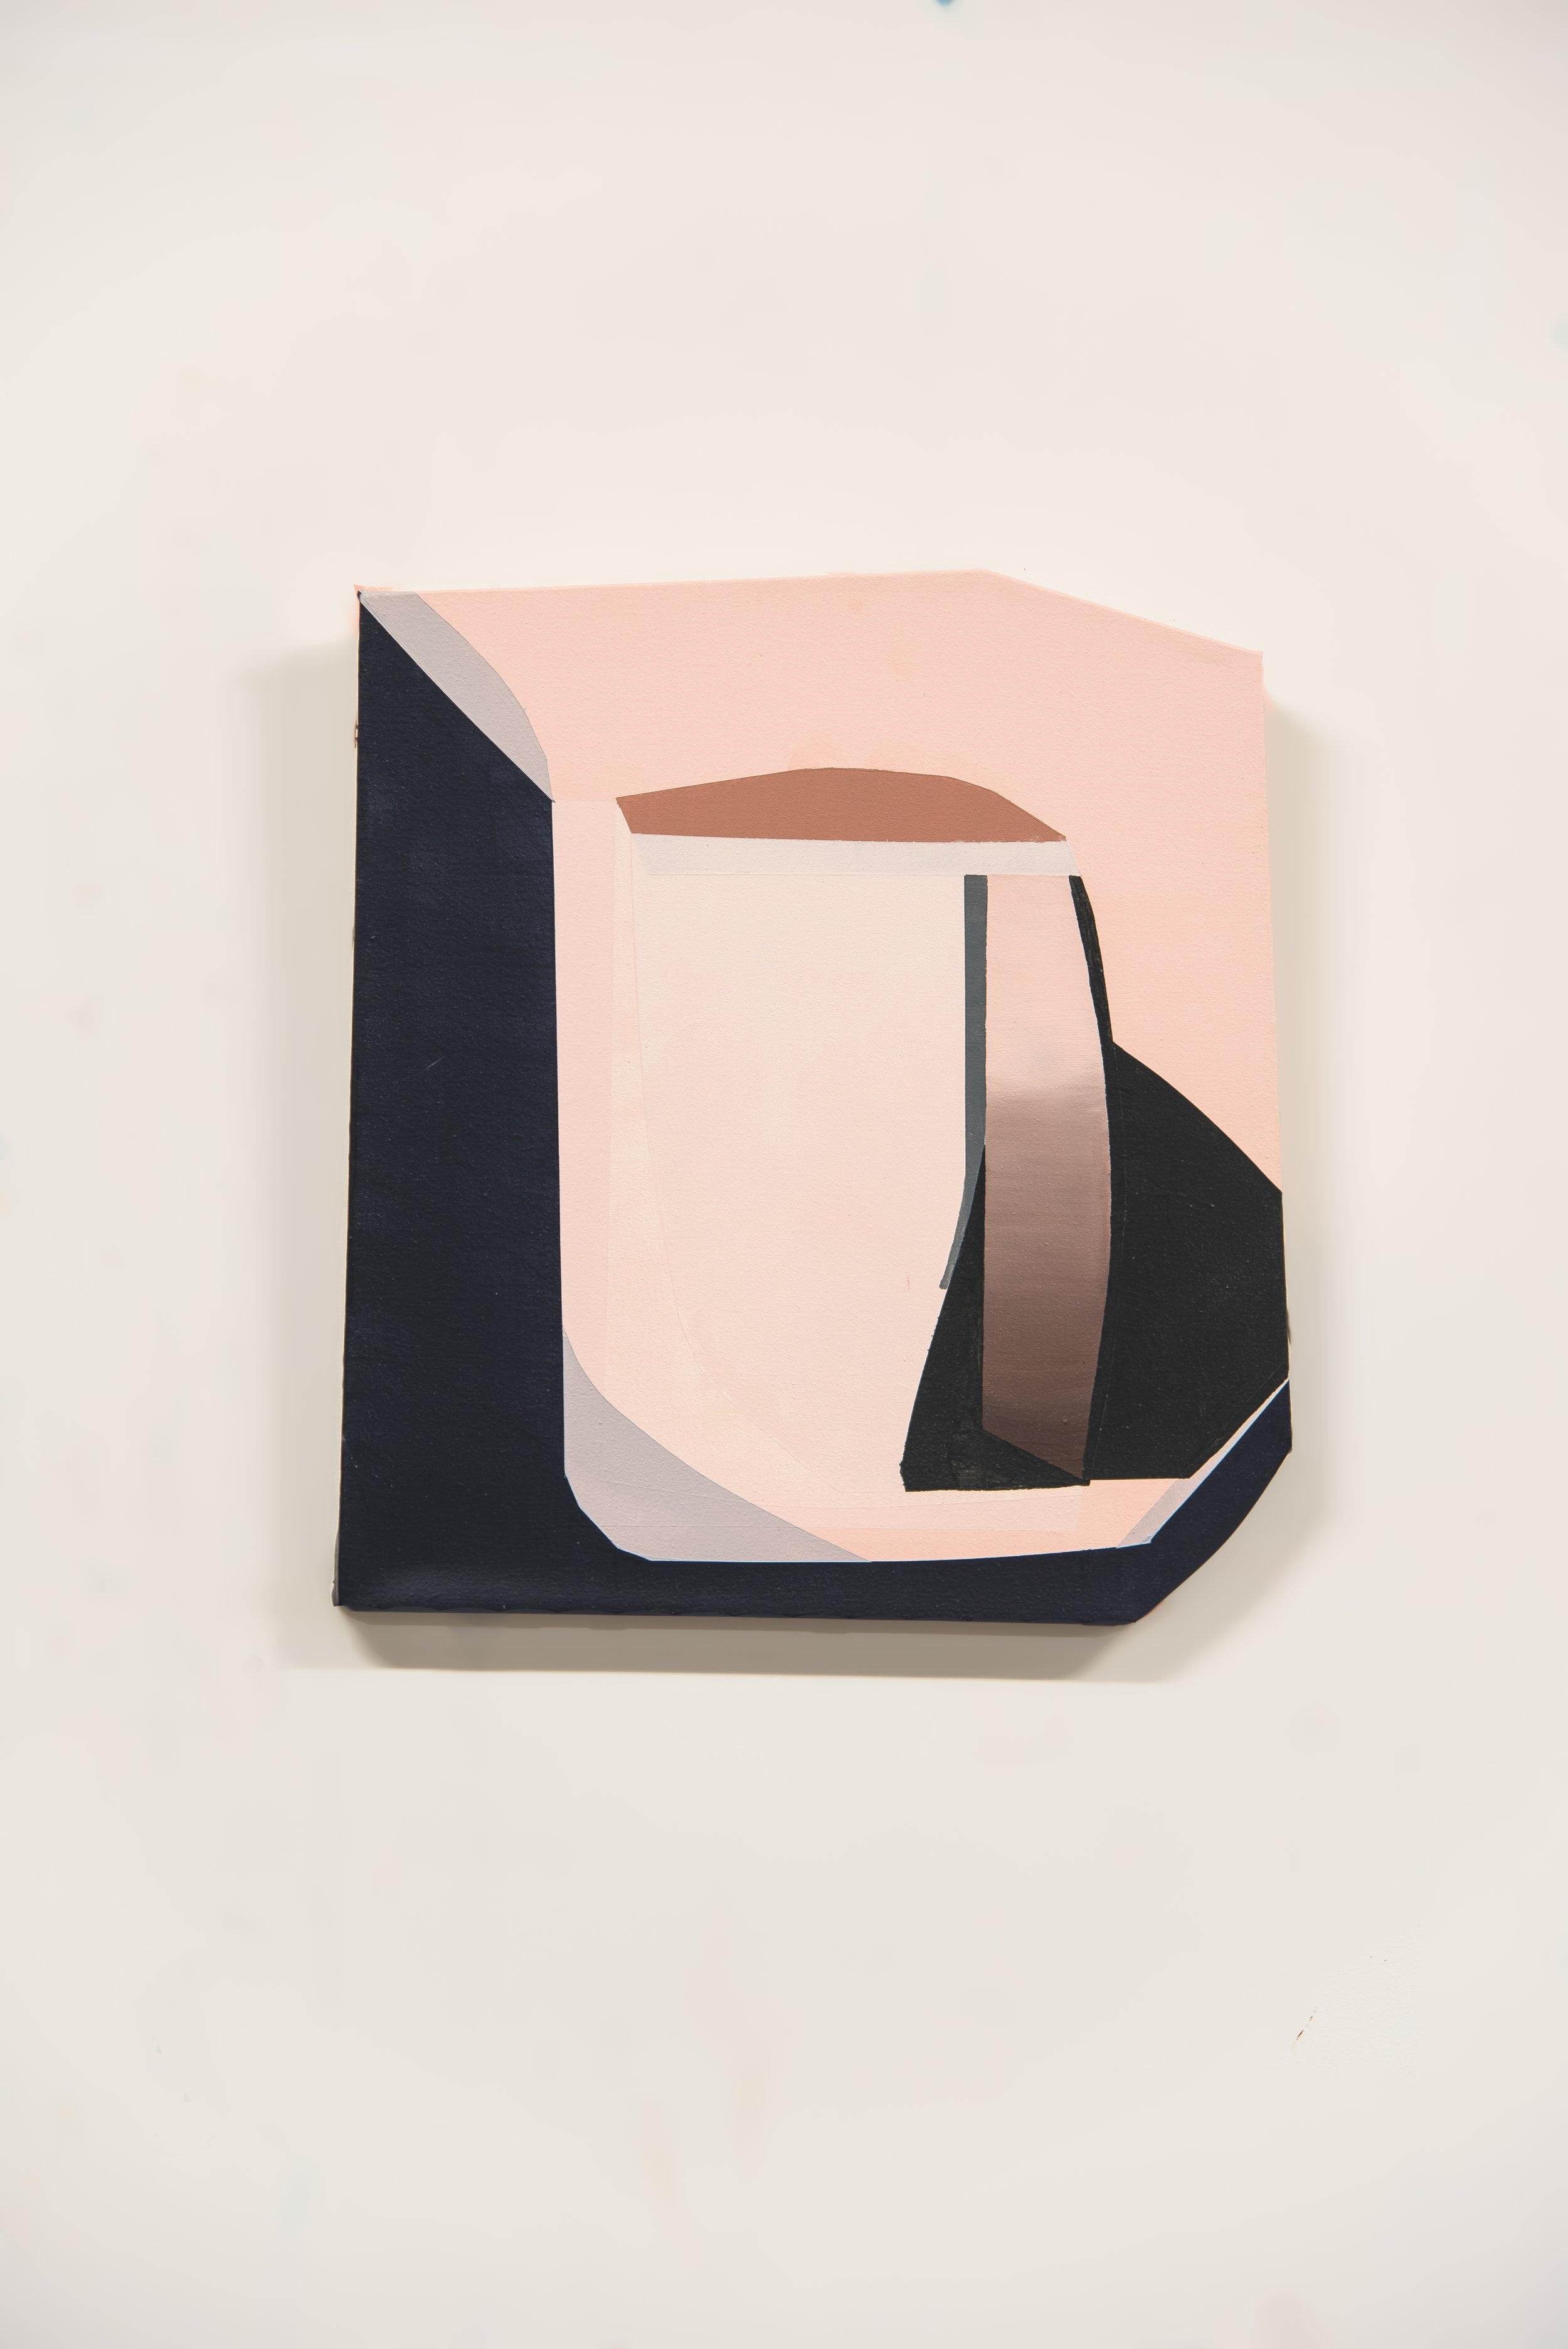 Proximity #1  Acrylic on canvas  20 x 22 in   2019